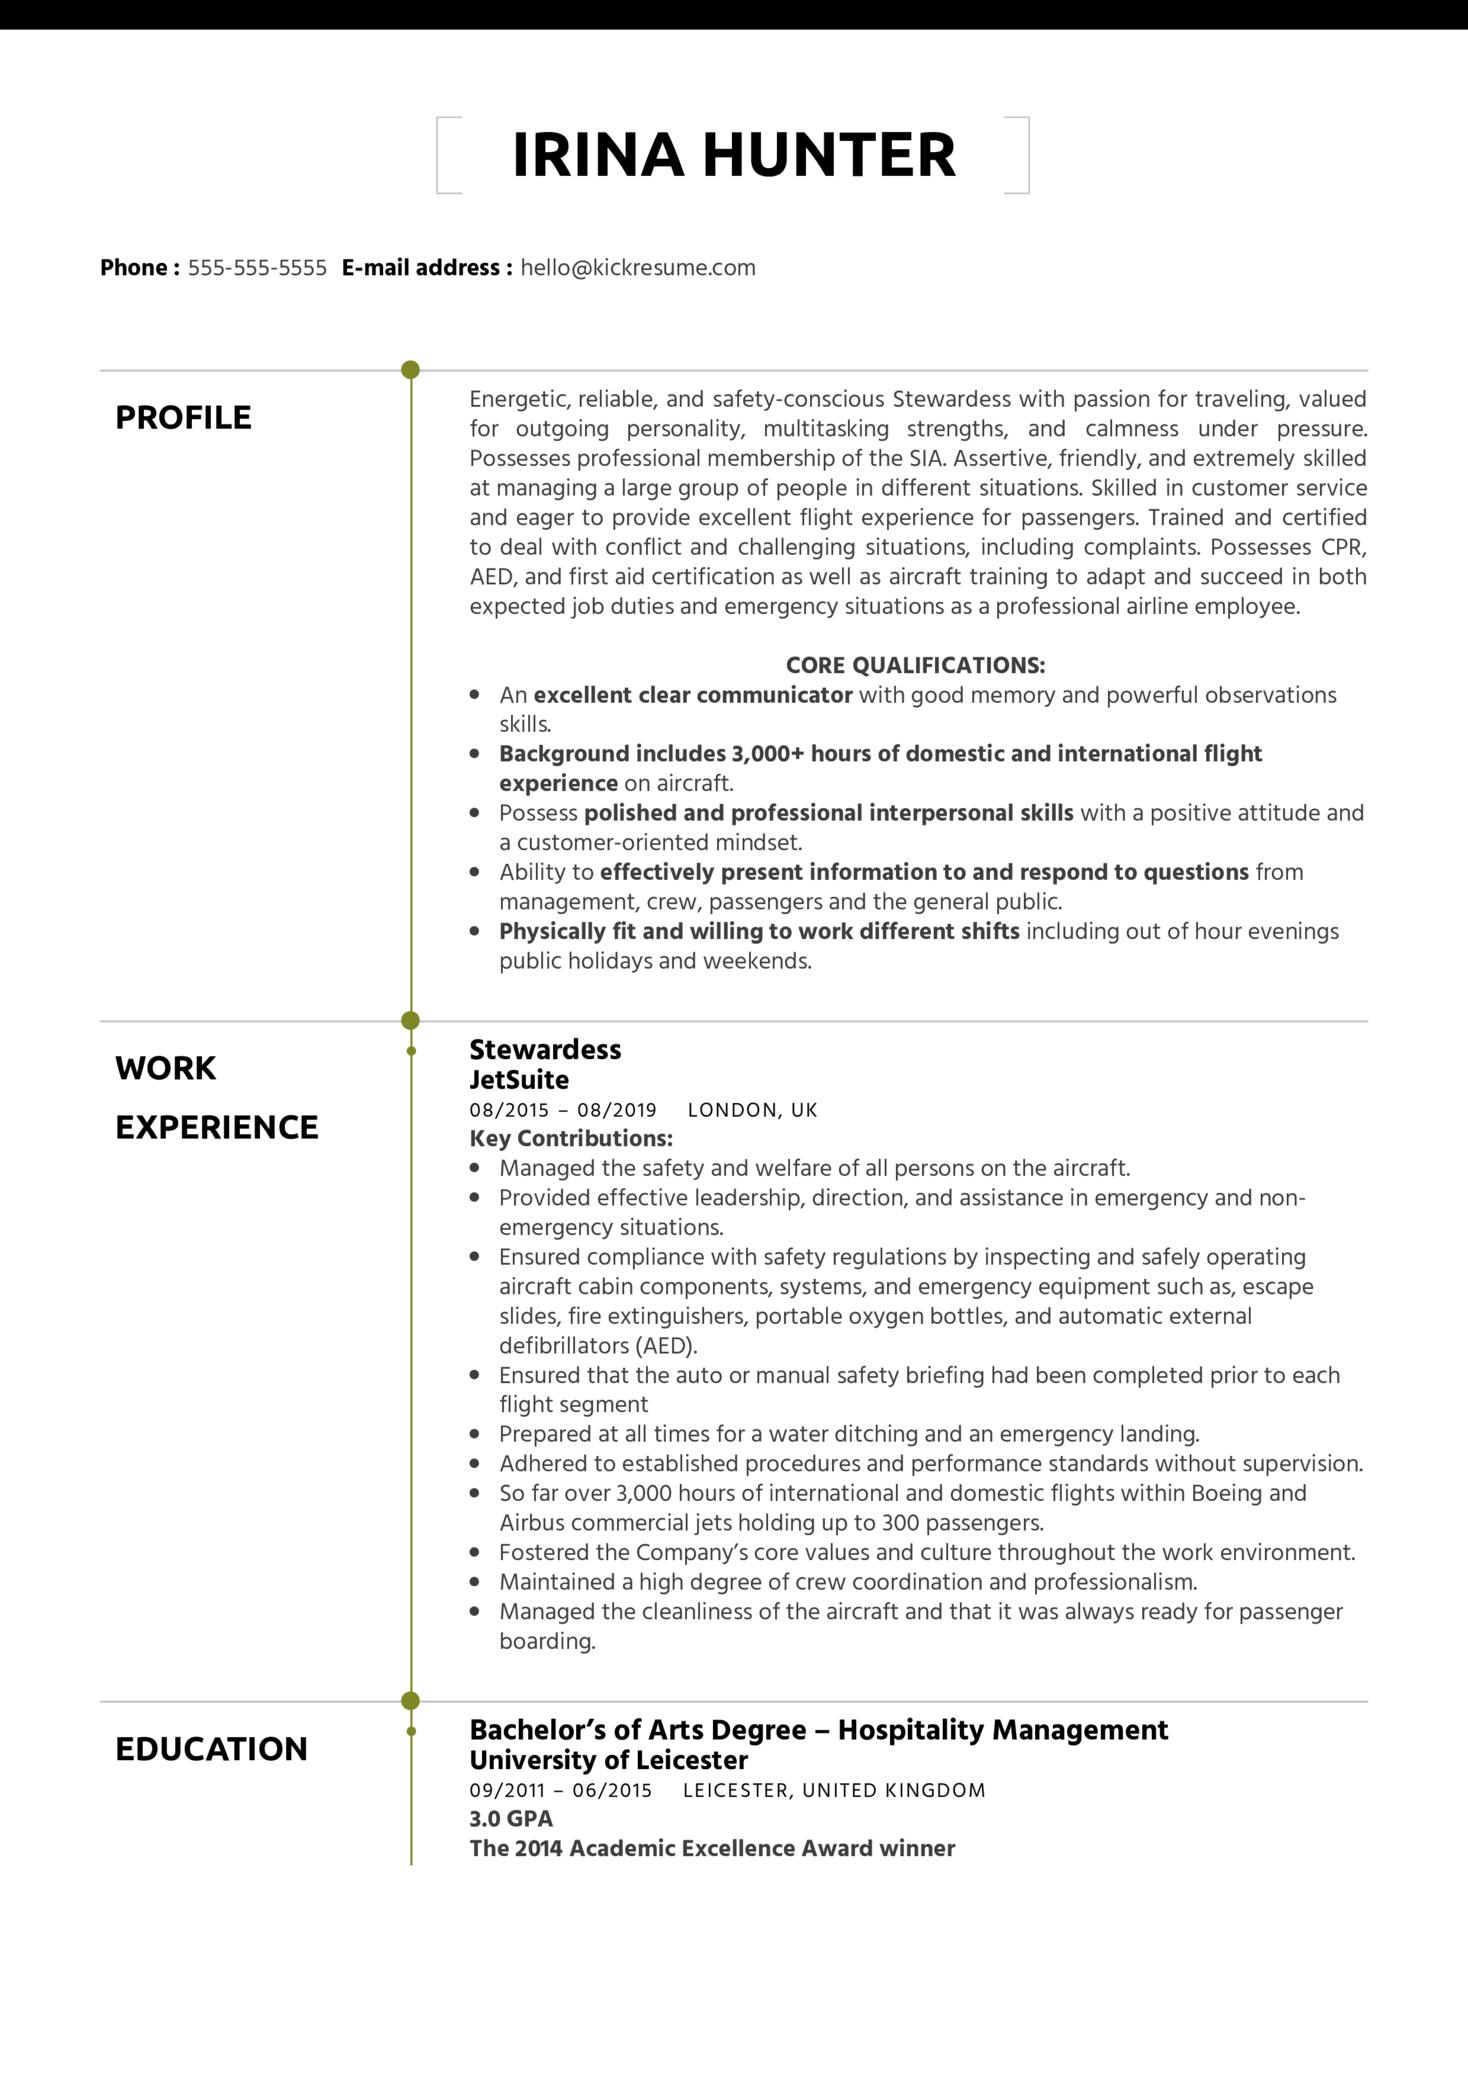 Stewardess Resume Example (parte 1)